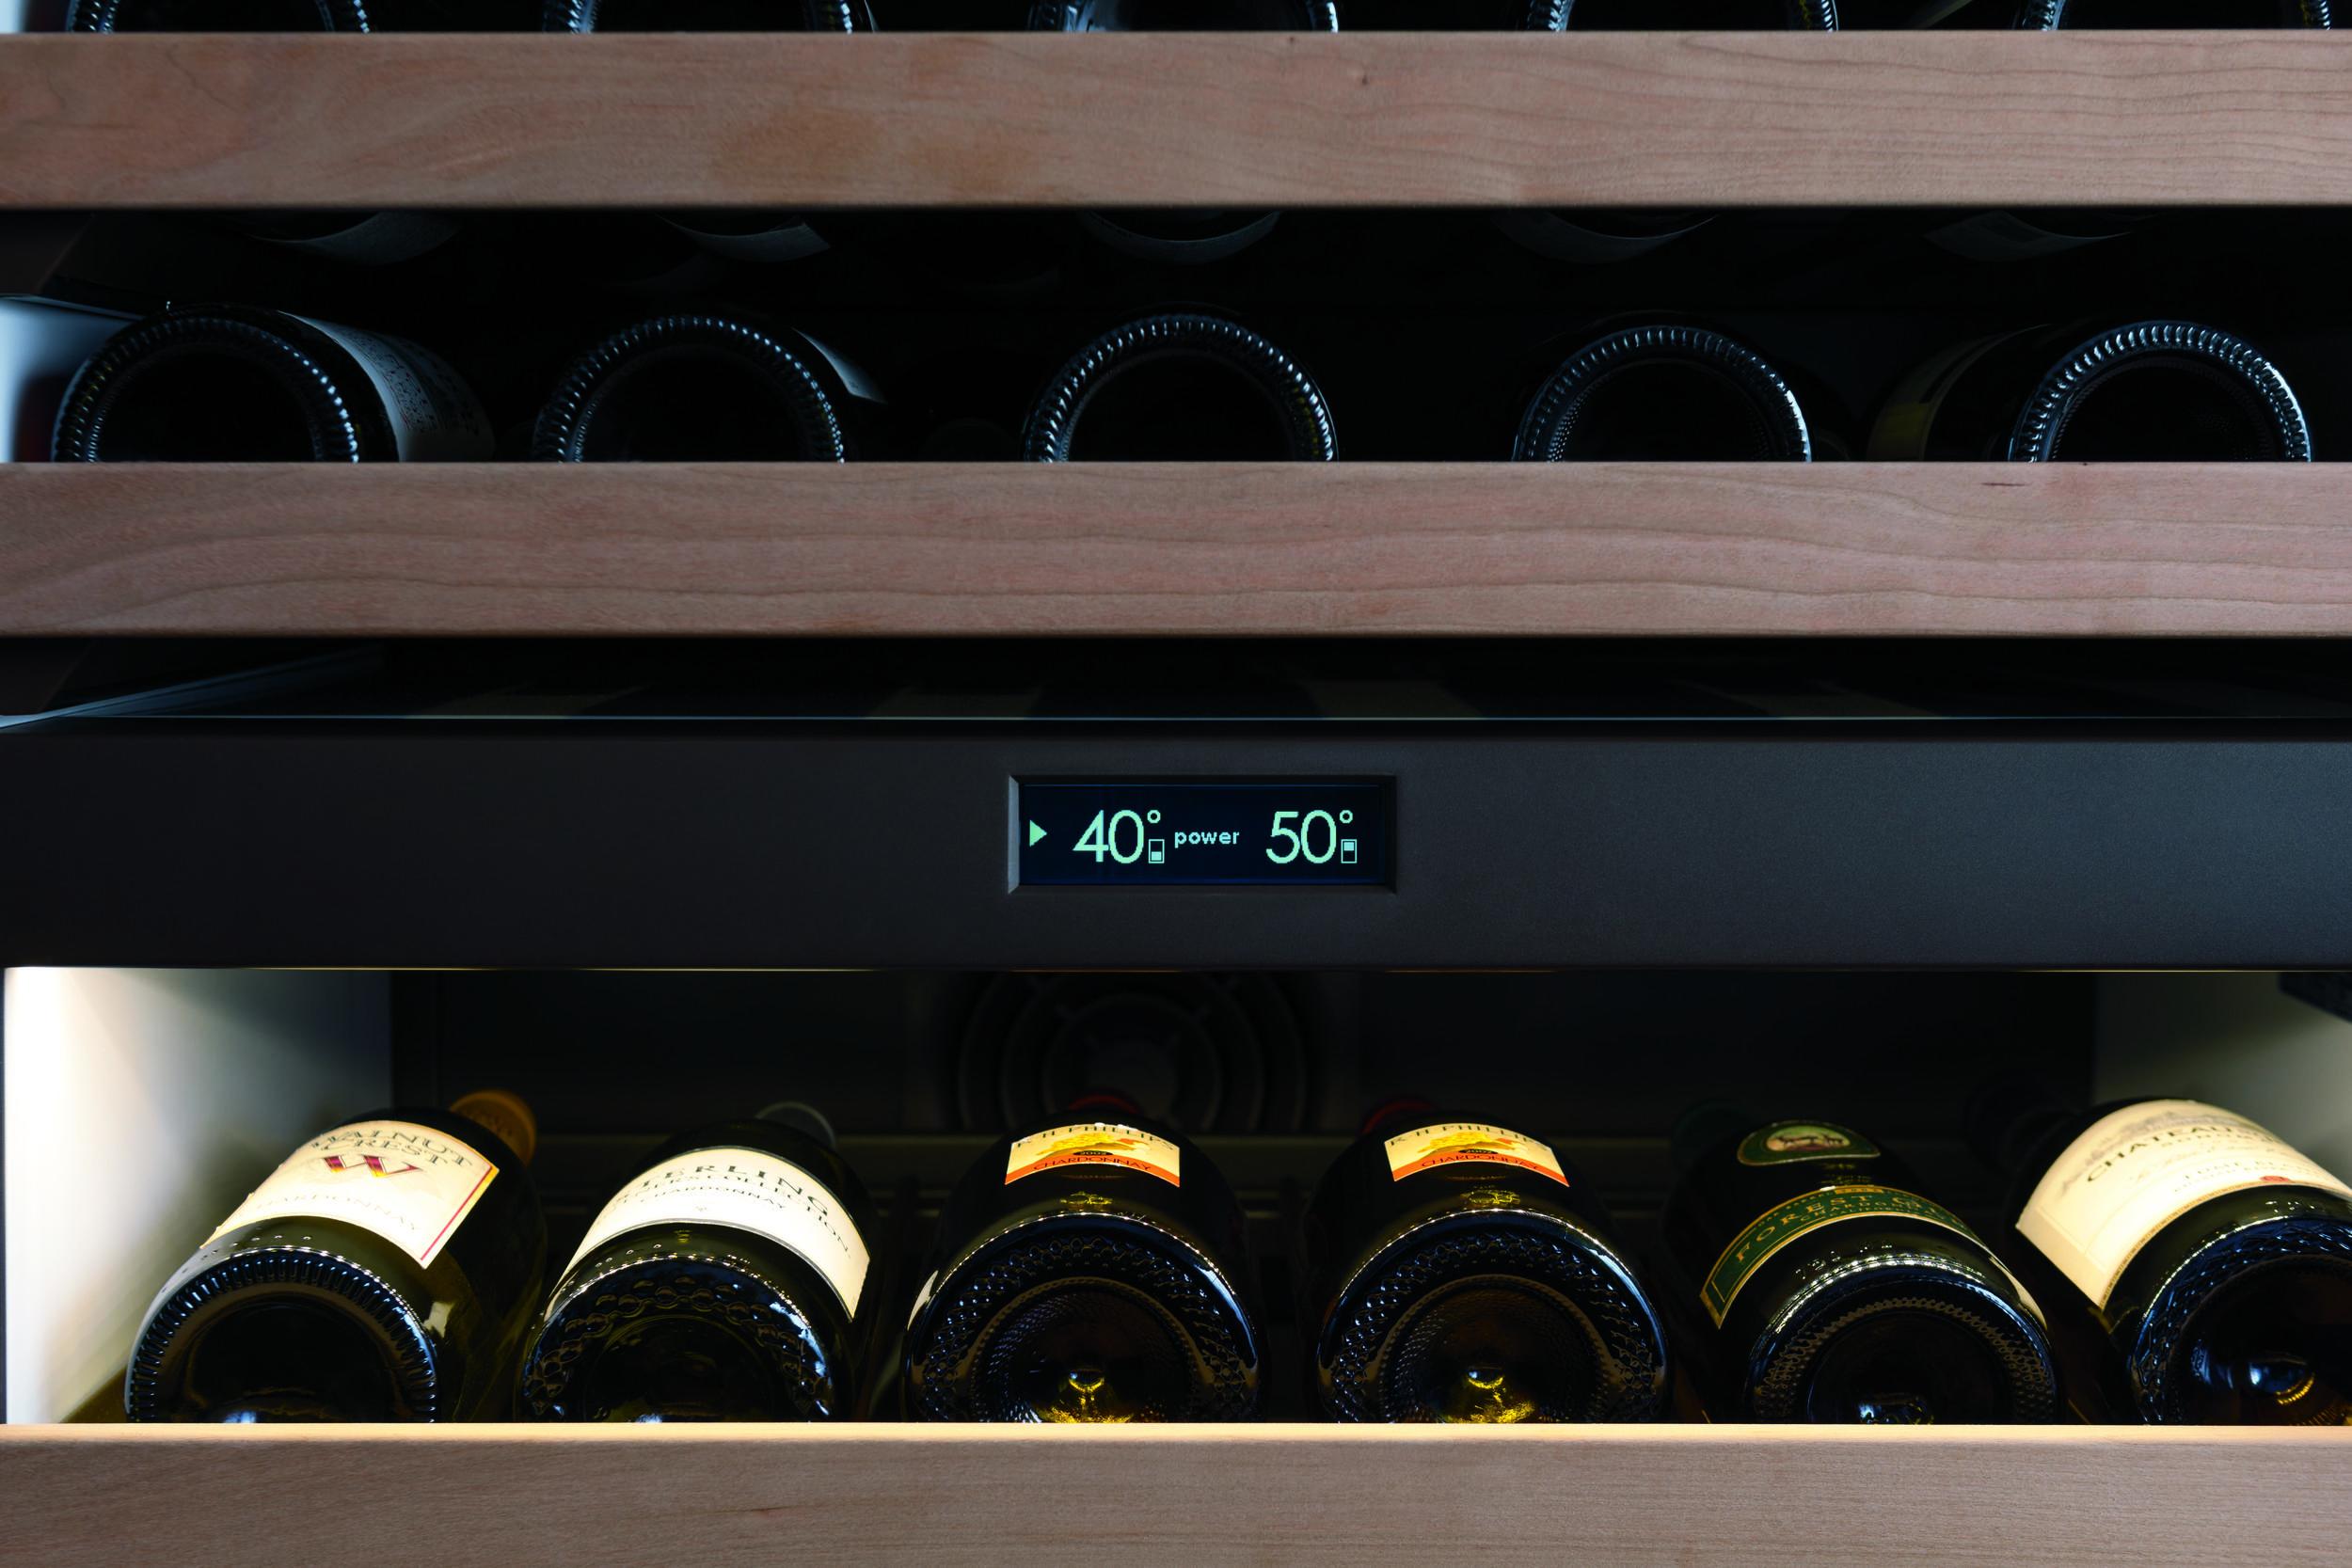 Wine Storage_Dual_Temp_Control_Panel.jpg